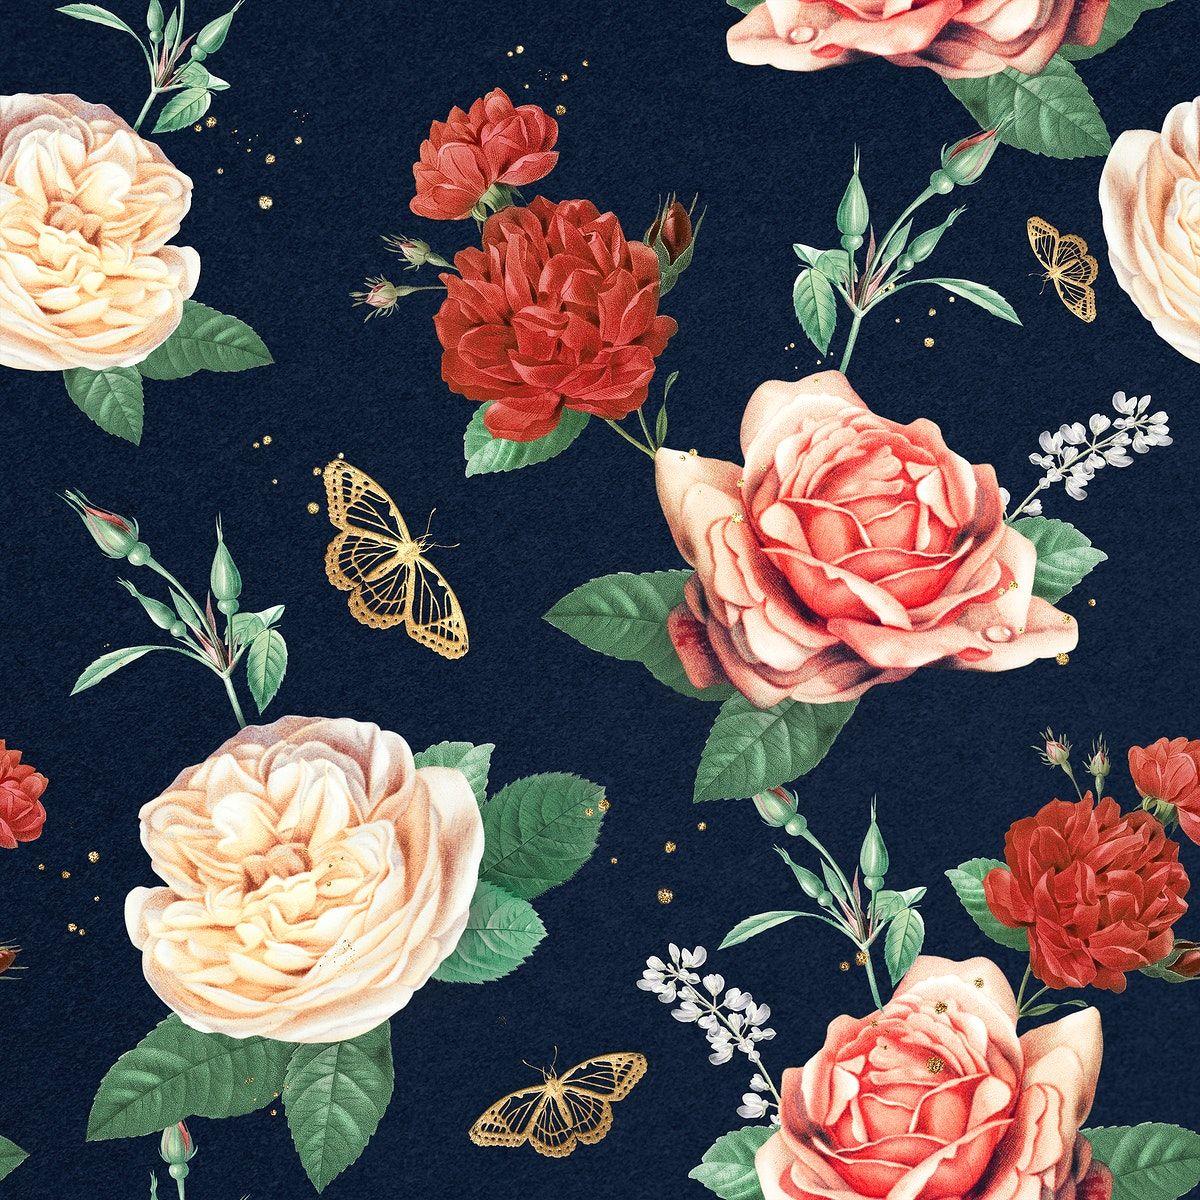 Download Premium Illustration Of Luxury Red Roses Psd Romantic Pattern In 2021 Flower Illustration Background Patterns Illustration